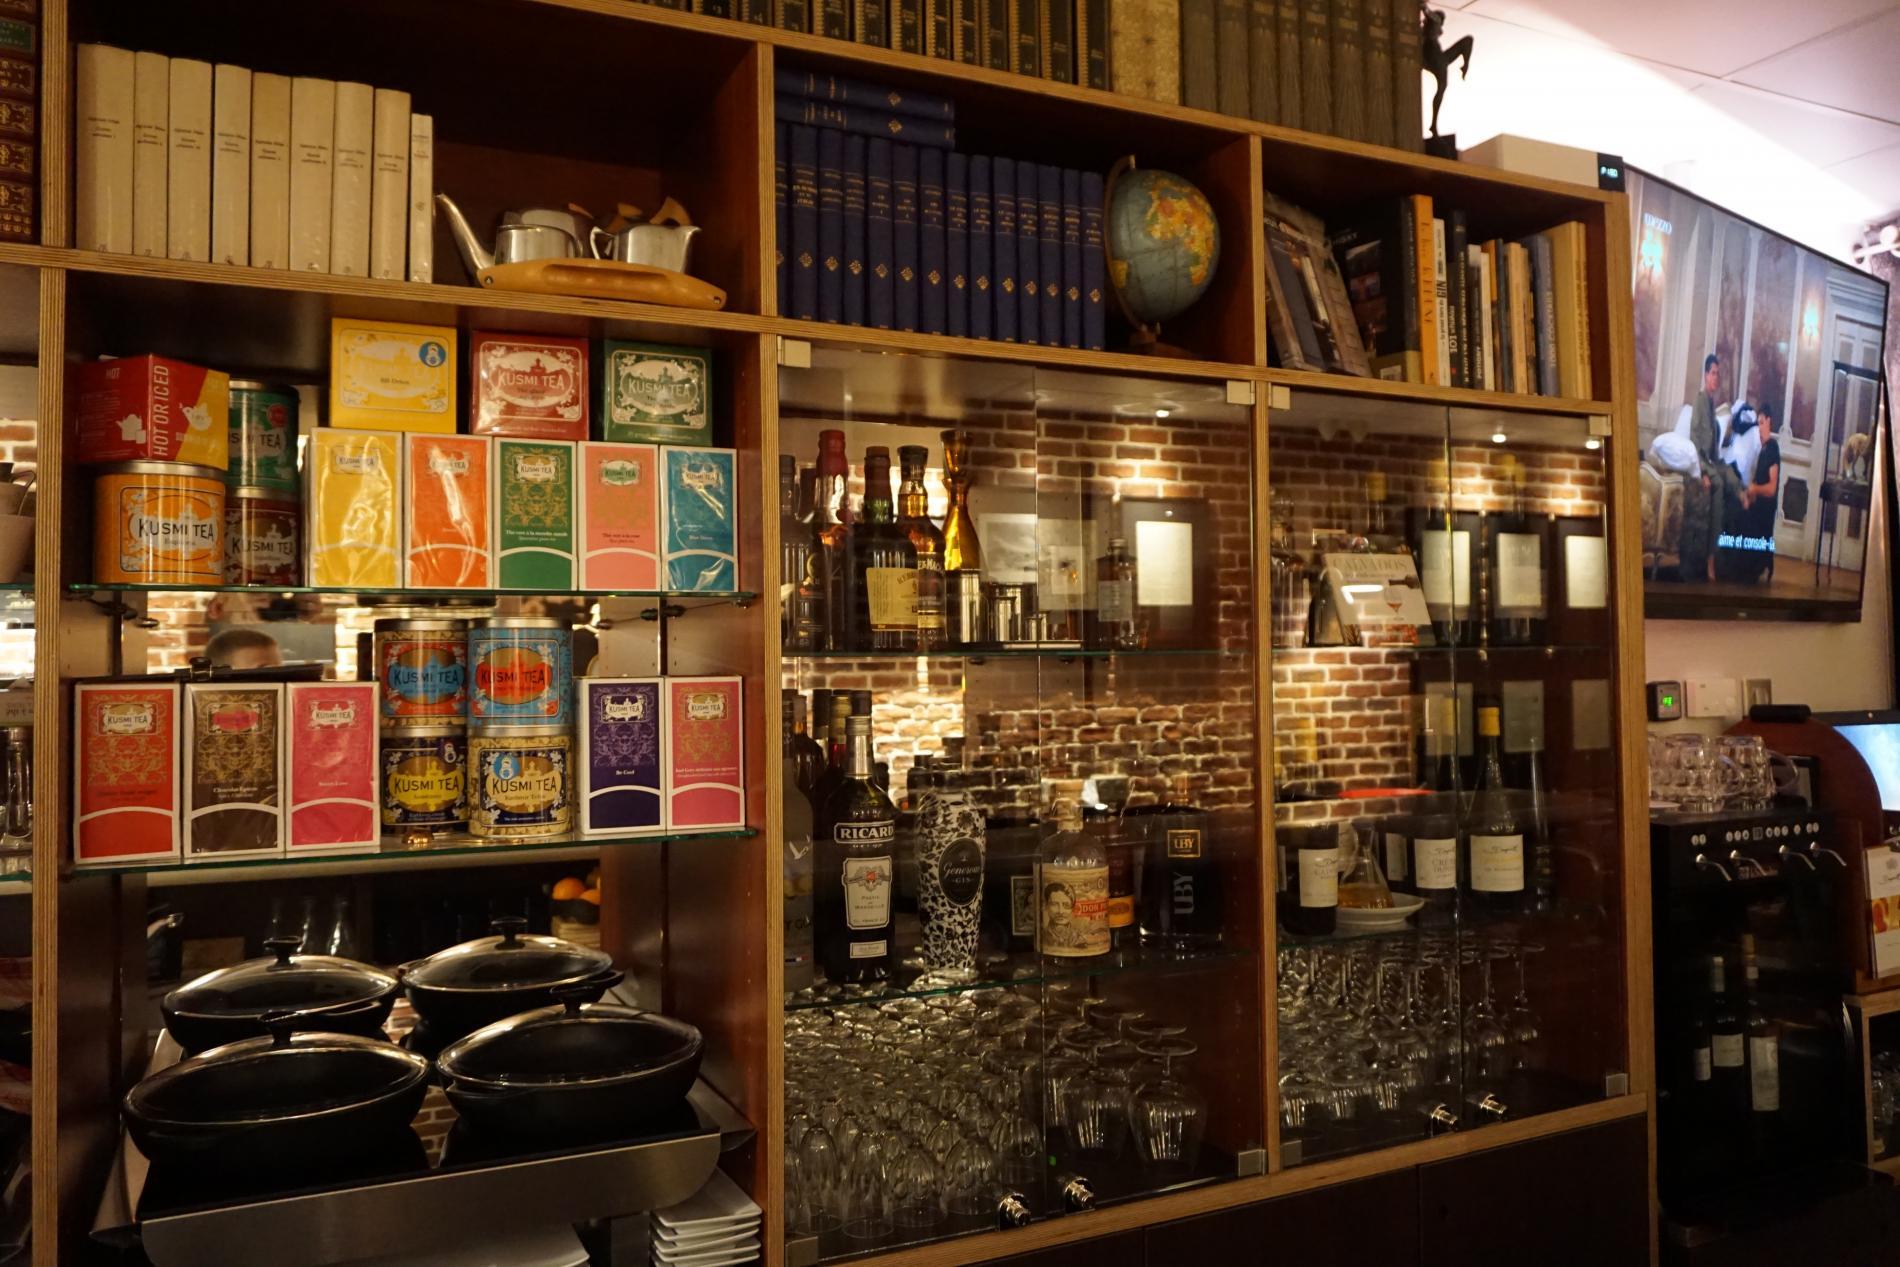 Welcome to the Bar de la Couronne